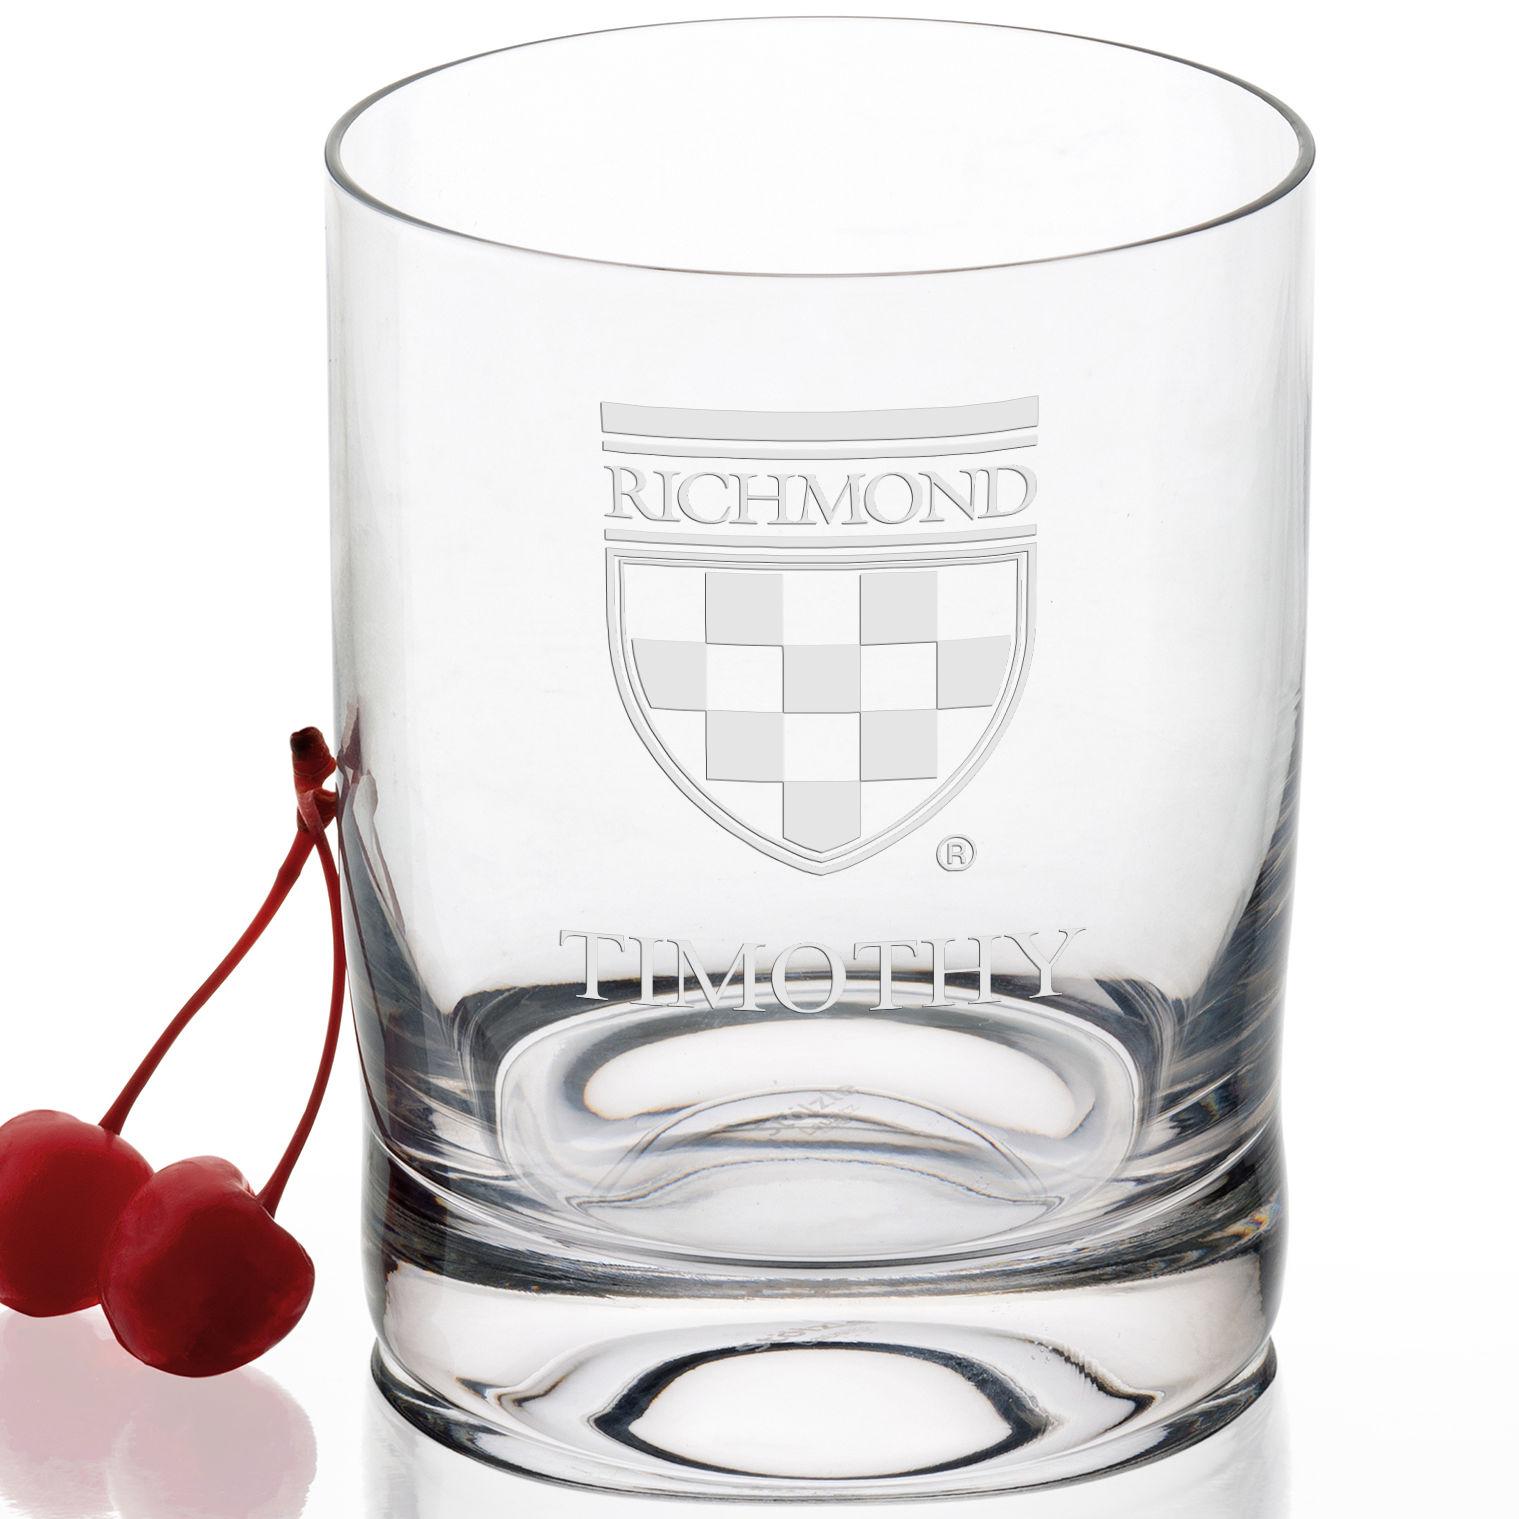 University of Richmond Tumbler Glasses - Set of 2 - Image 2